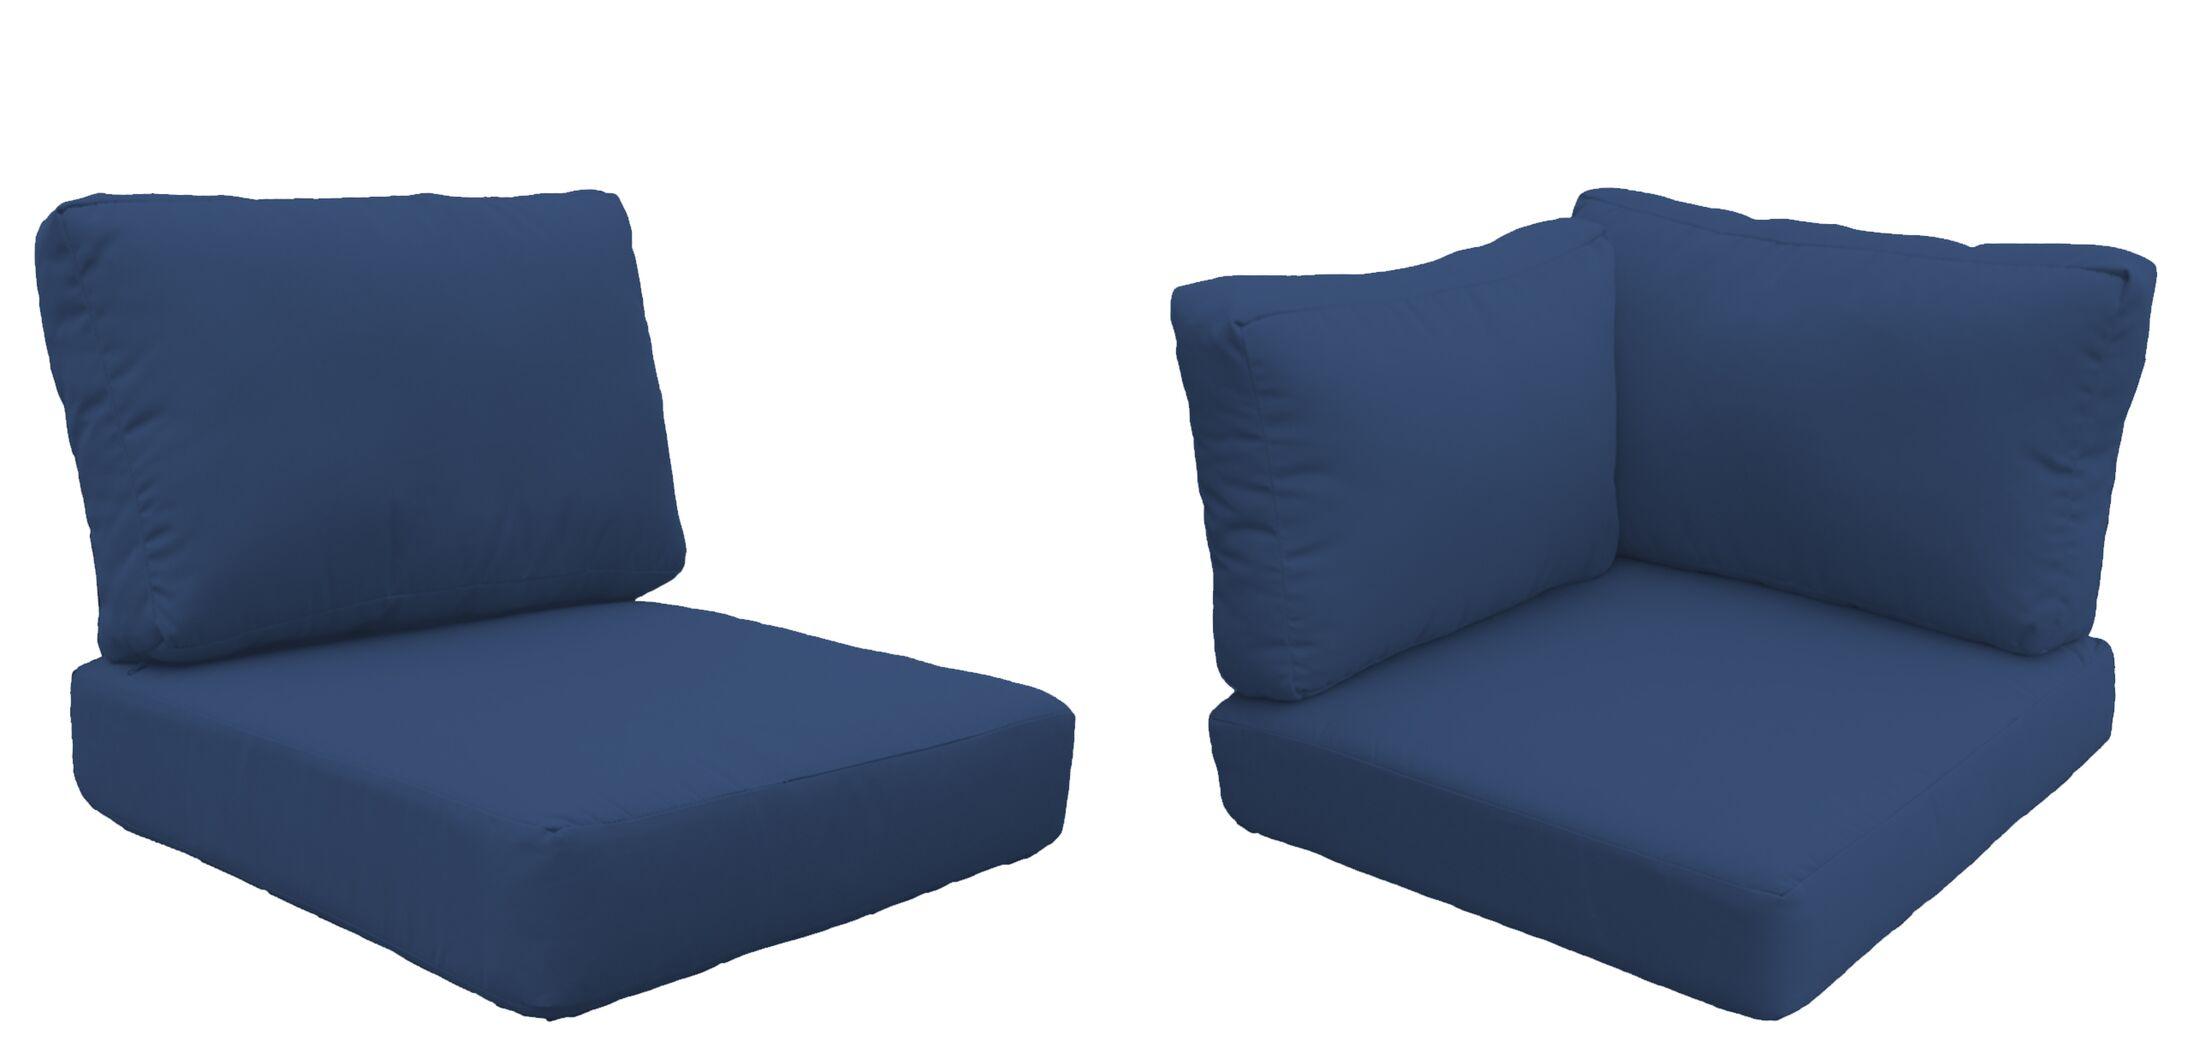 Miami 11 Piece Outdoor Cushion Set Fabric: Navy